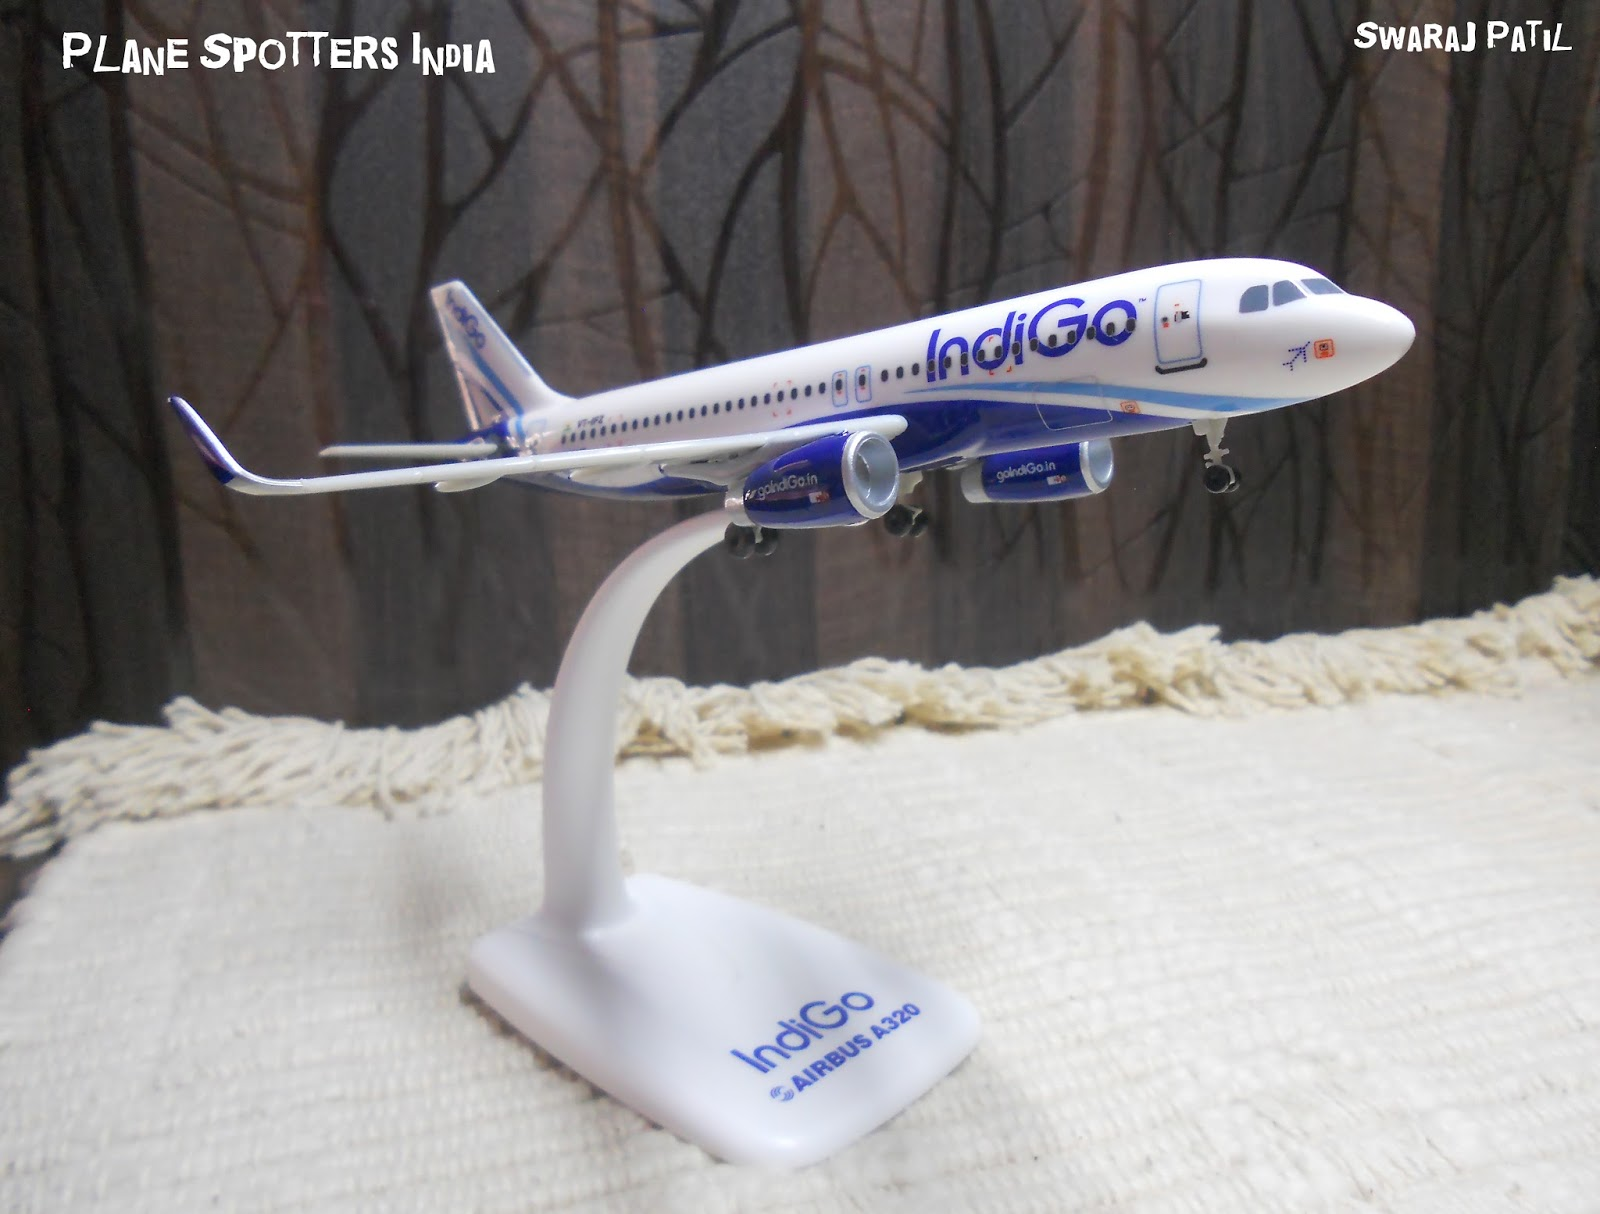 Indigo's Airbus A320 | 1:200 Scale Model   - Plane Spotters India